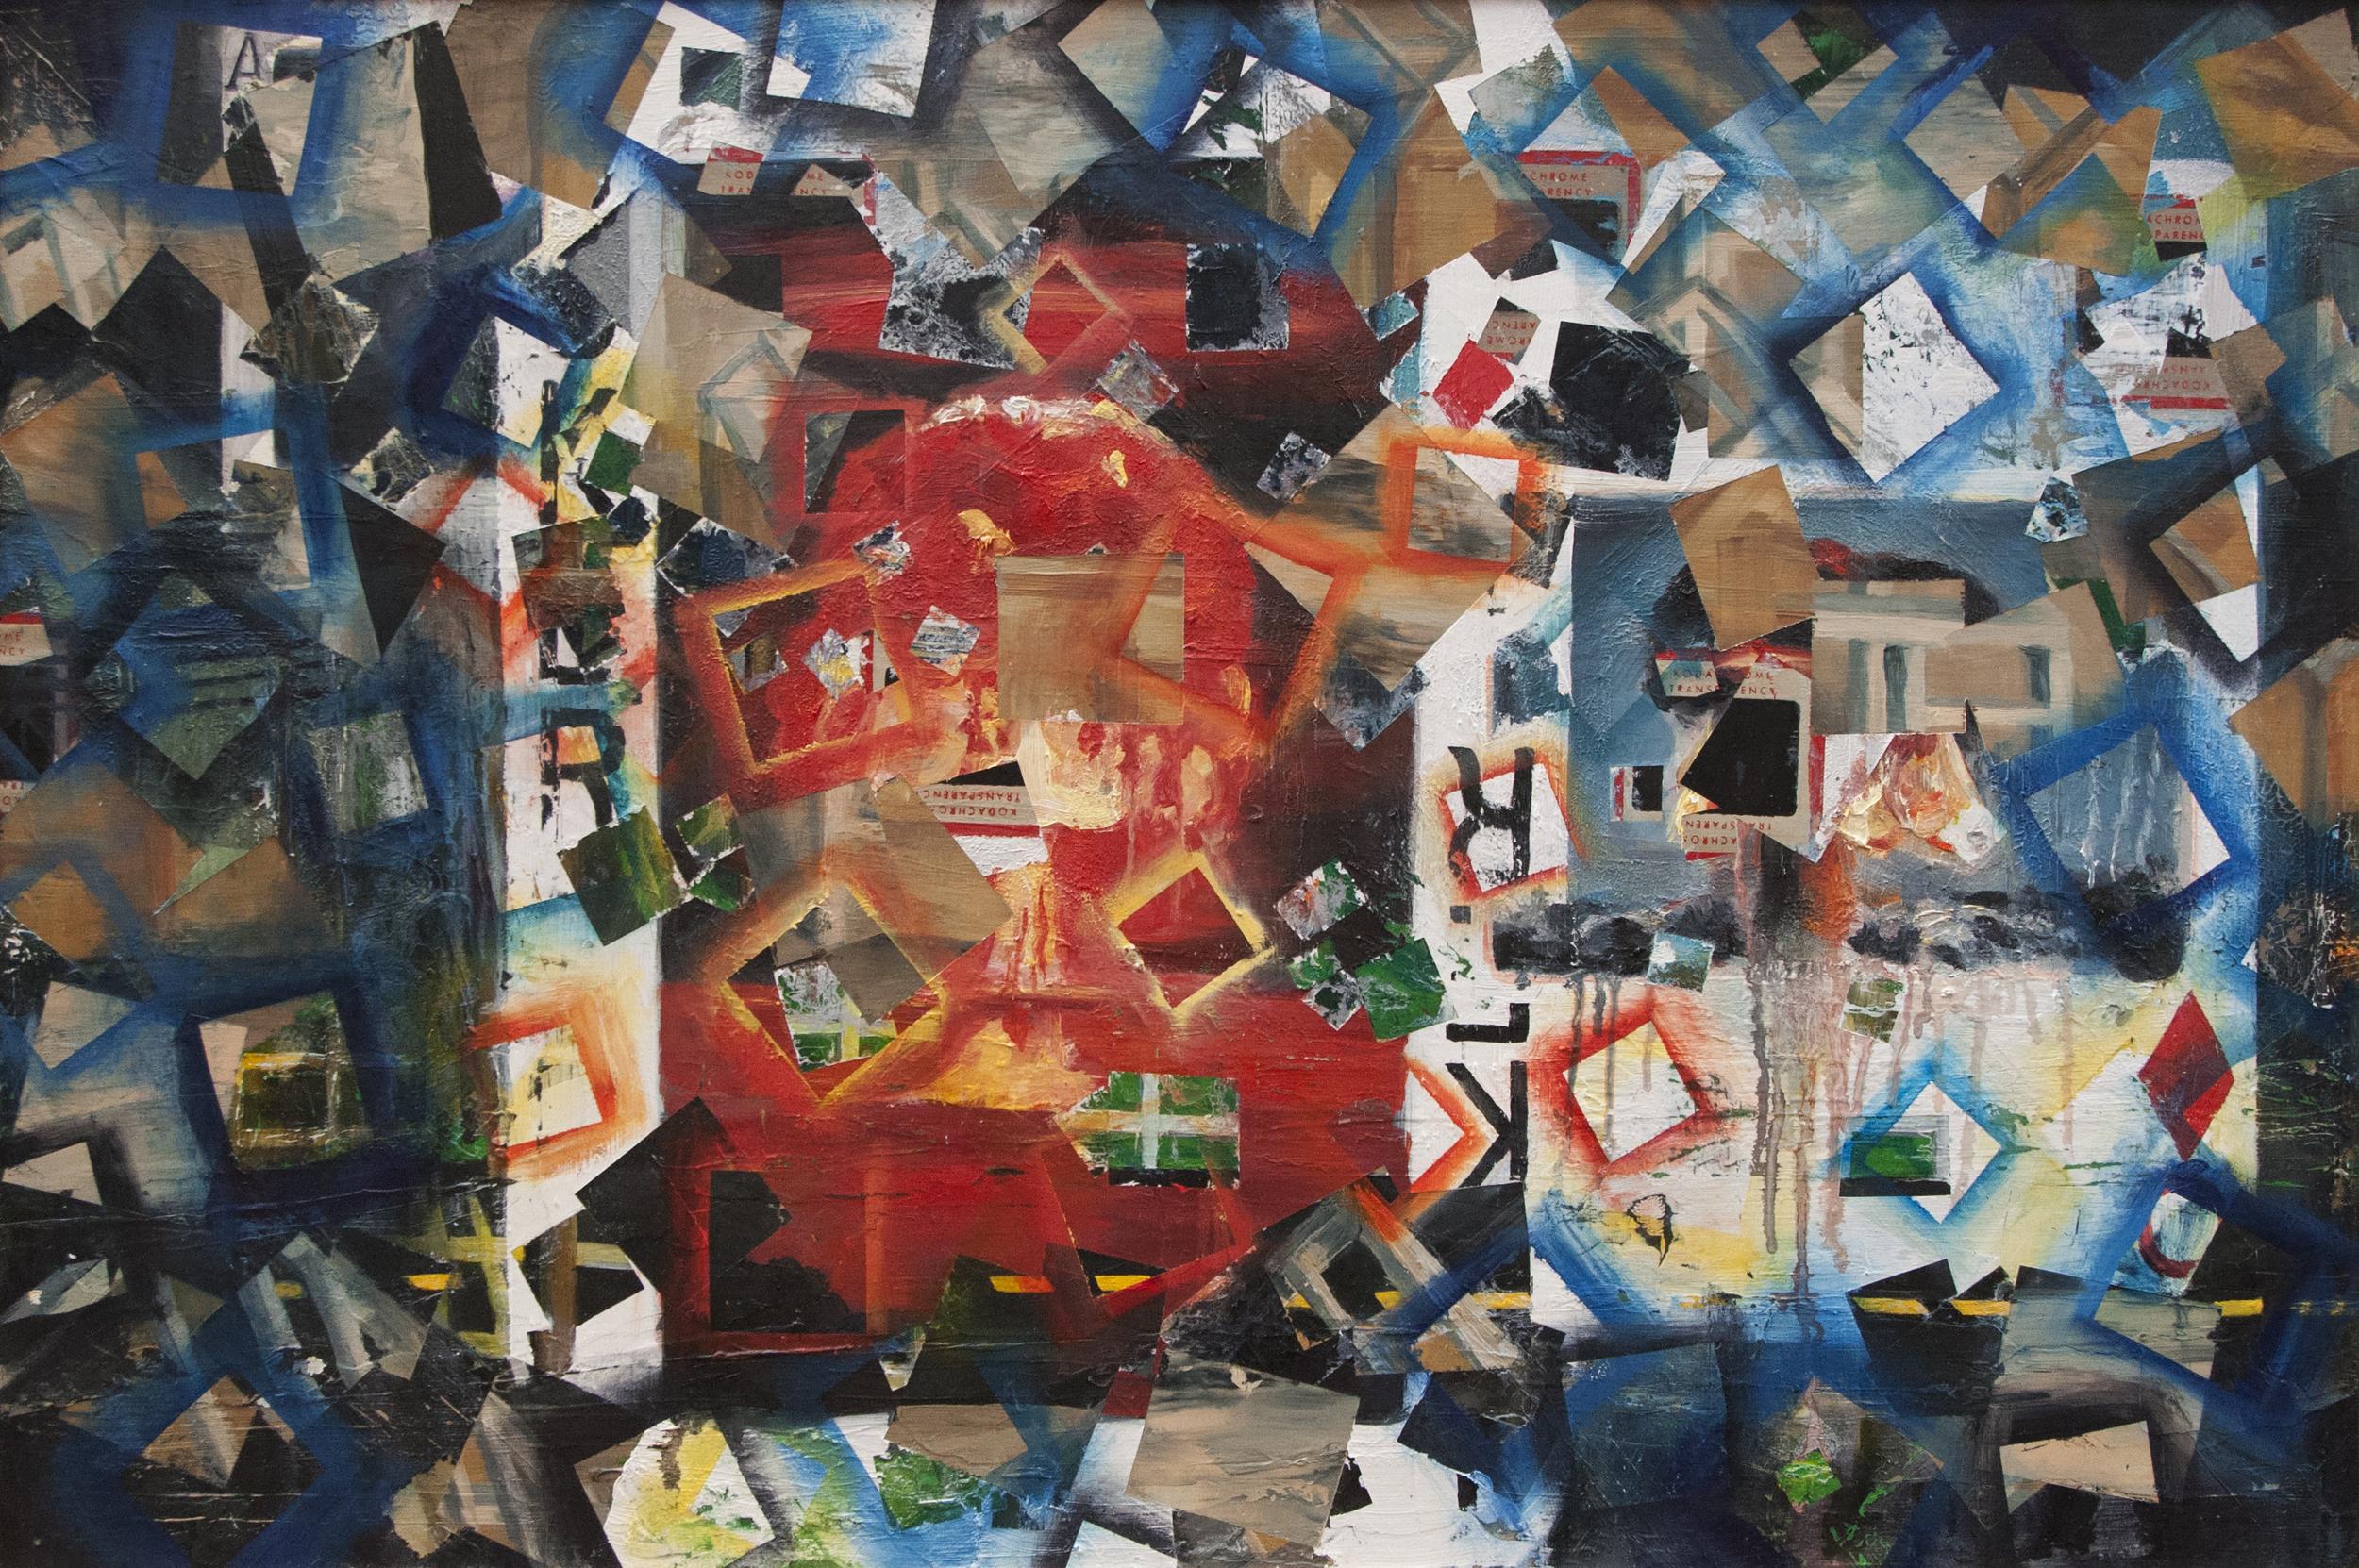 Genessa Kealoha,  Agoraphobe,  2013, oil on wood panel, 24 x 36 inches